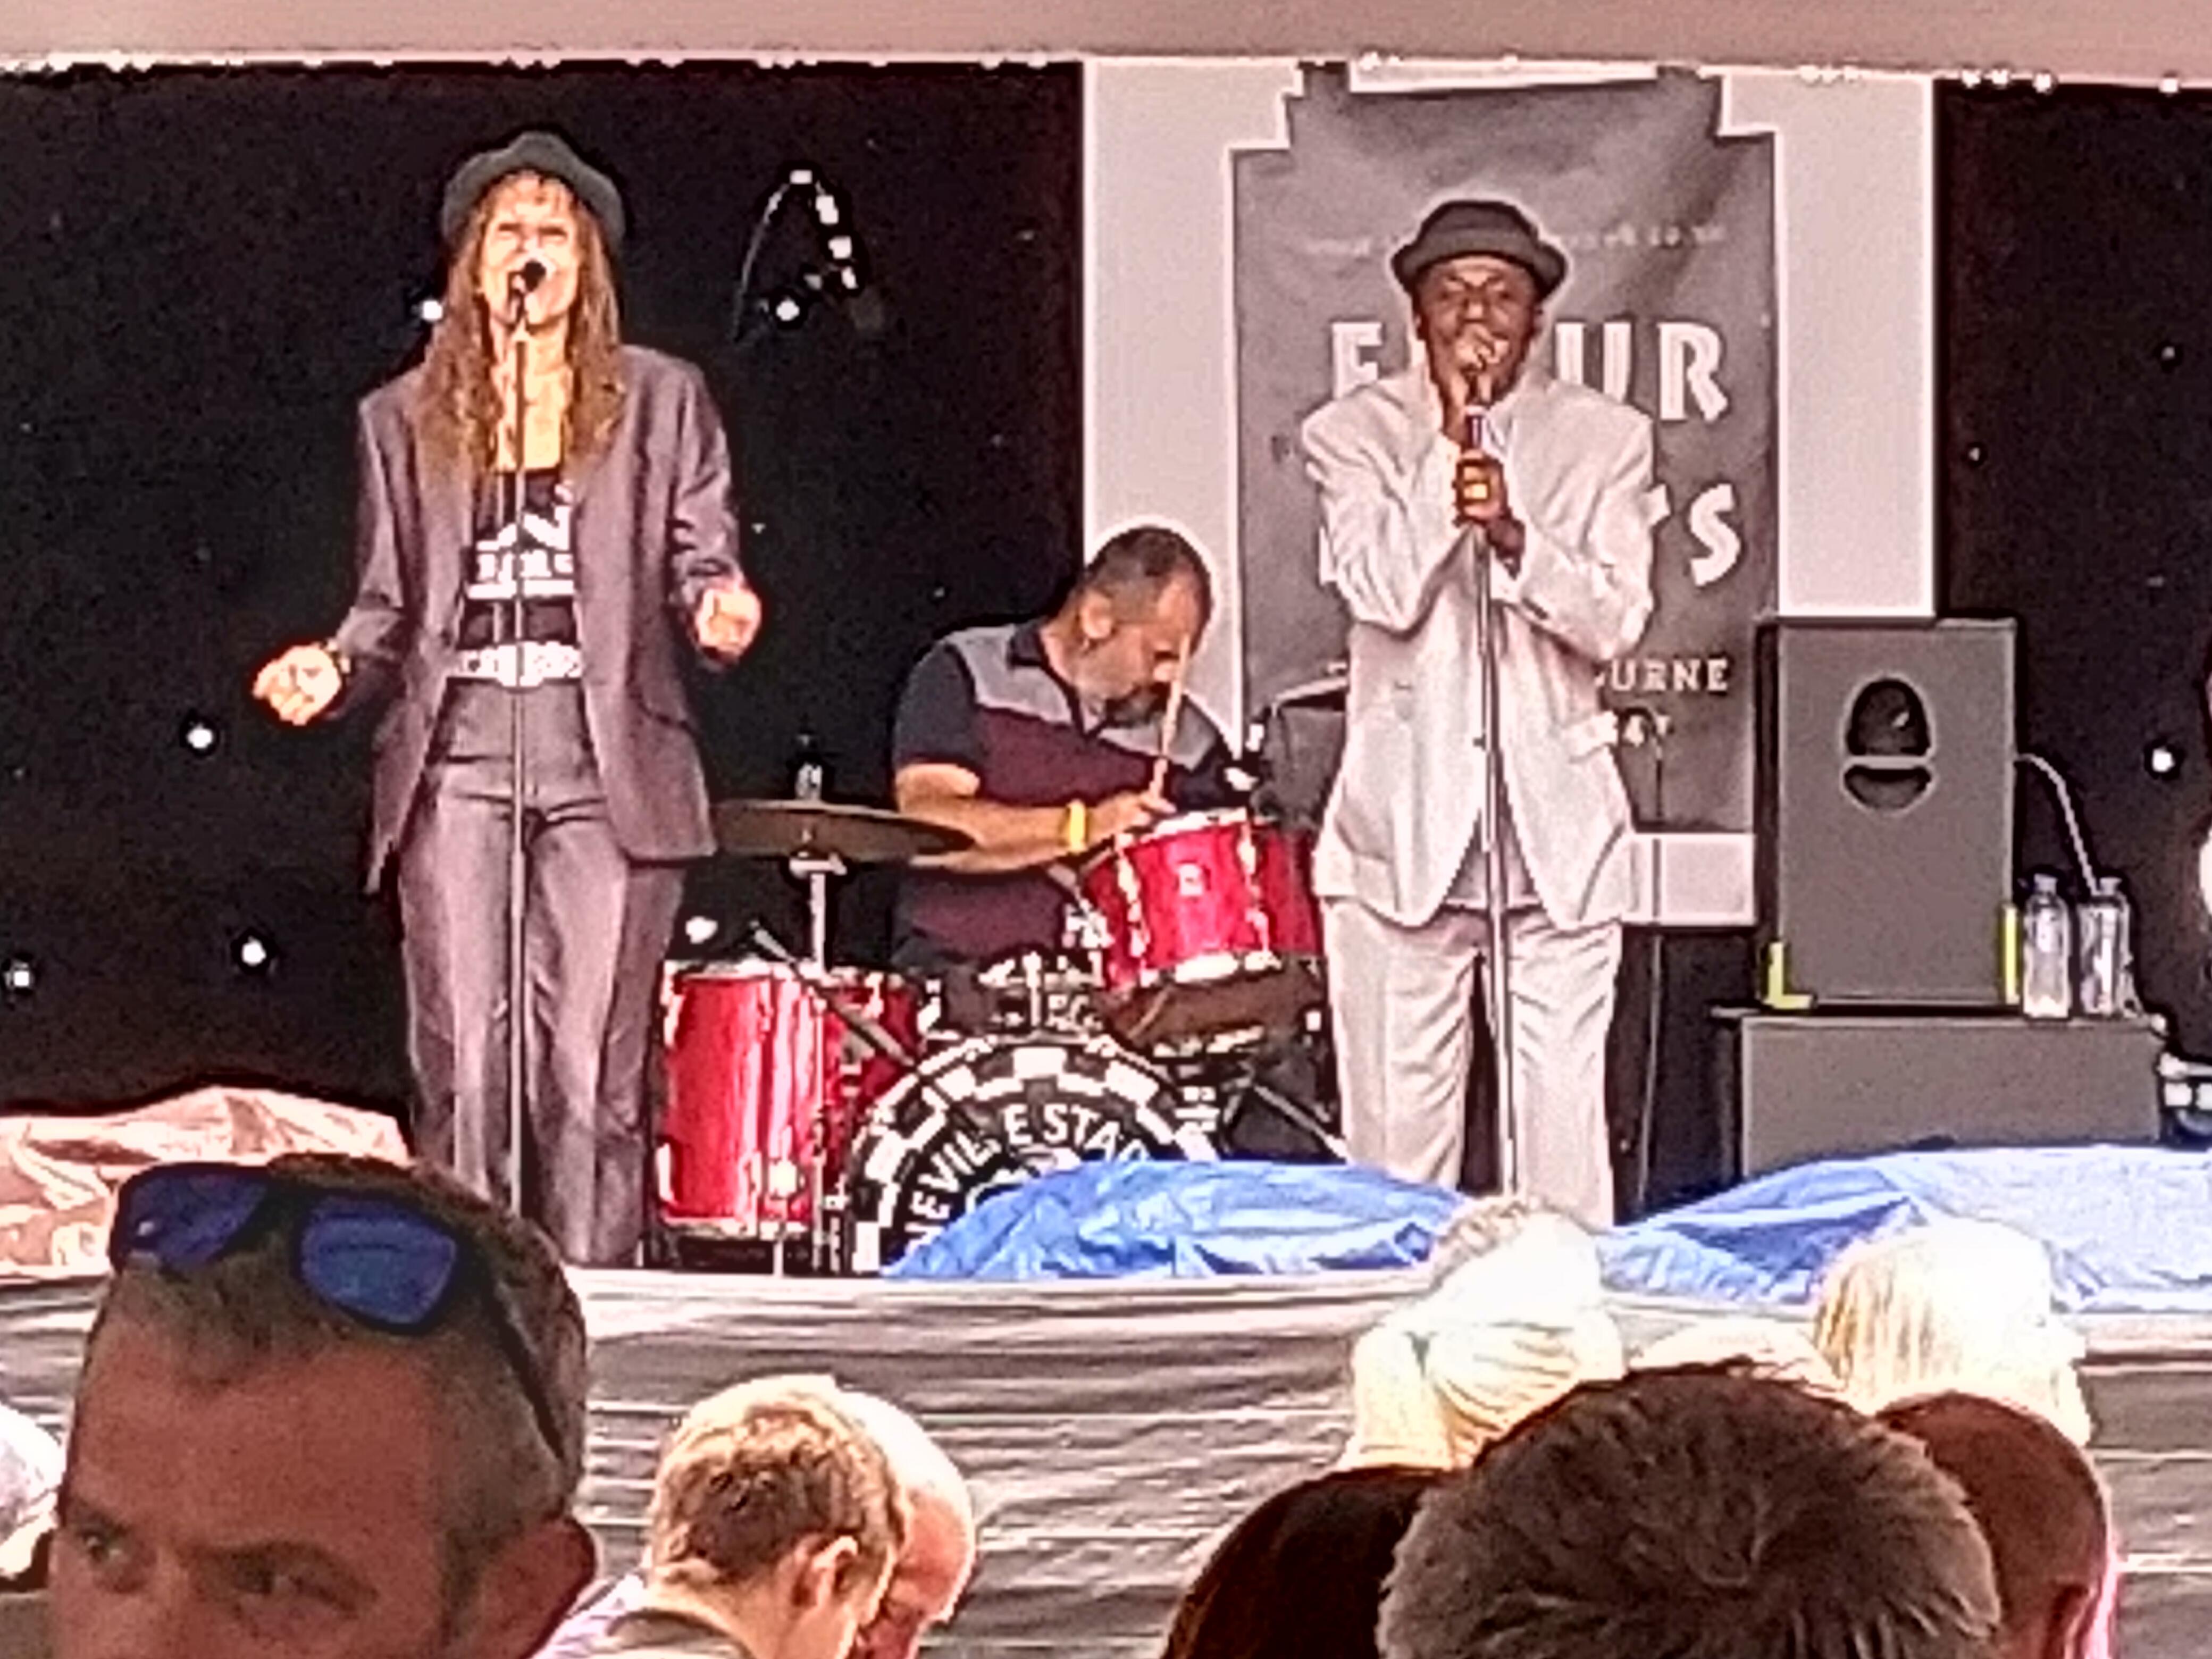 Neville Stanple at Fleur Fest 5